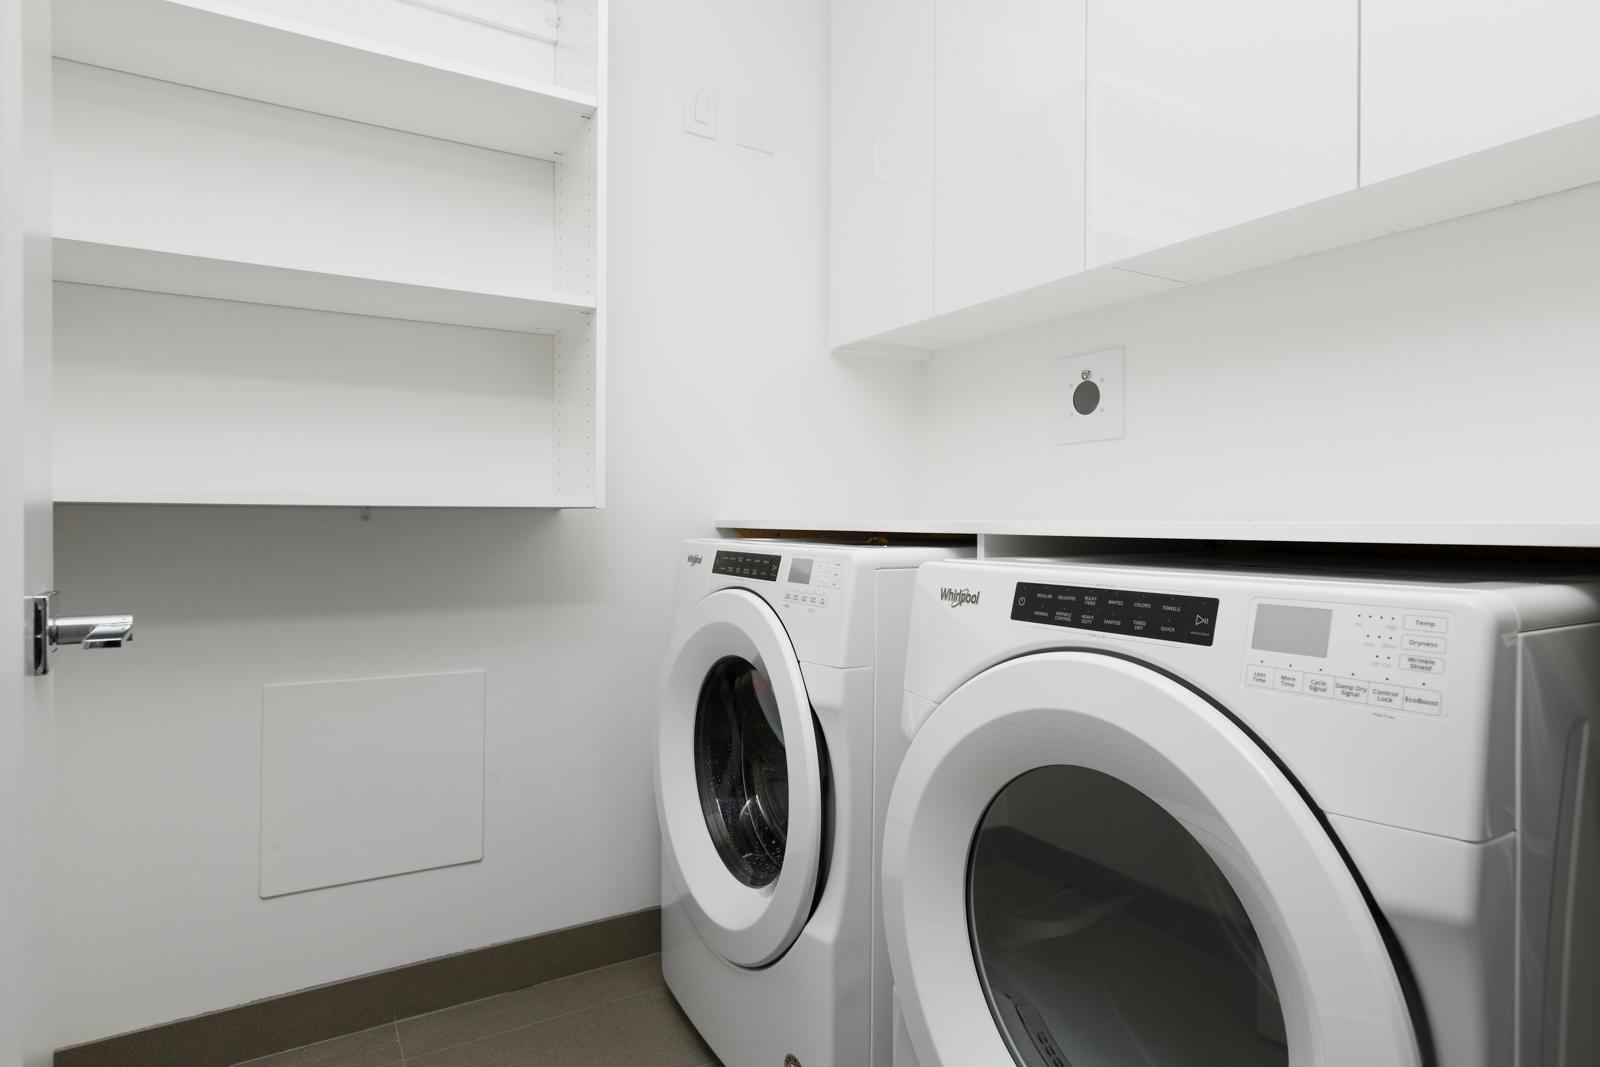 Washer dryer in rental property in The Kirkland building in Kerrisdale Vancouver